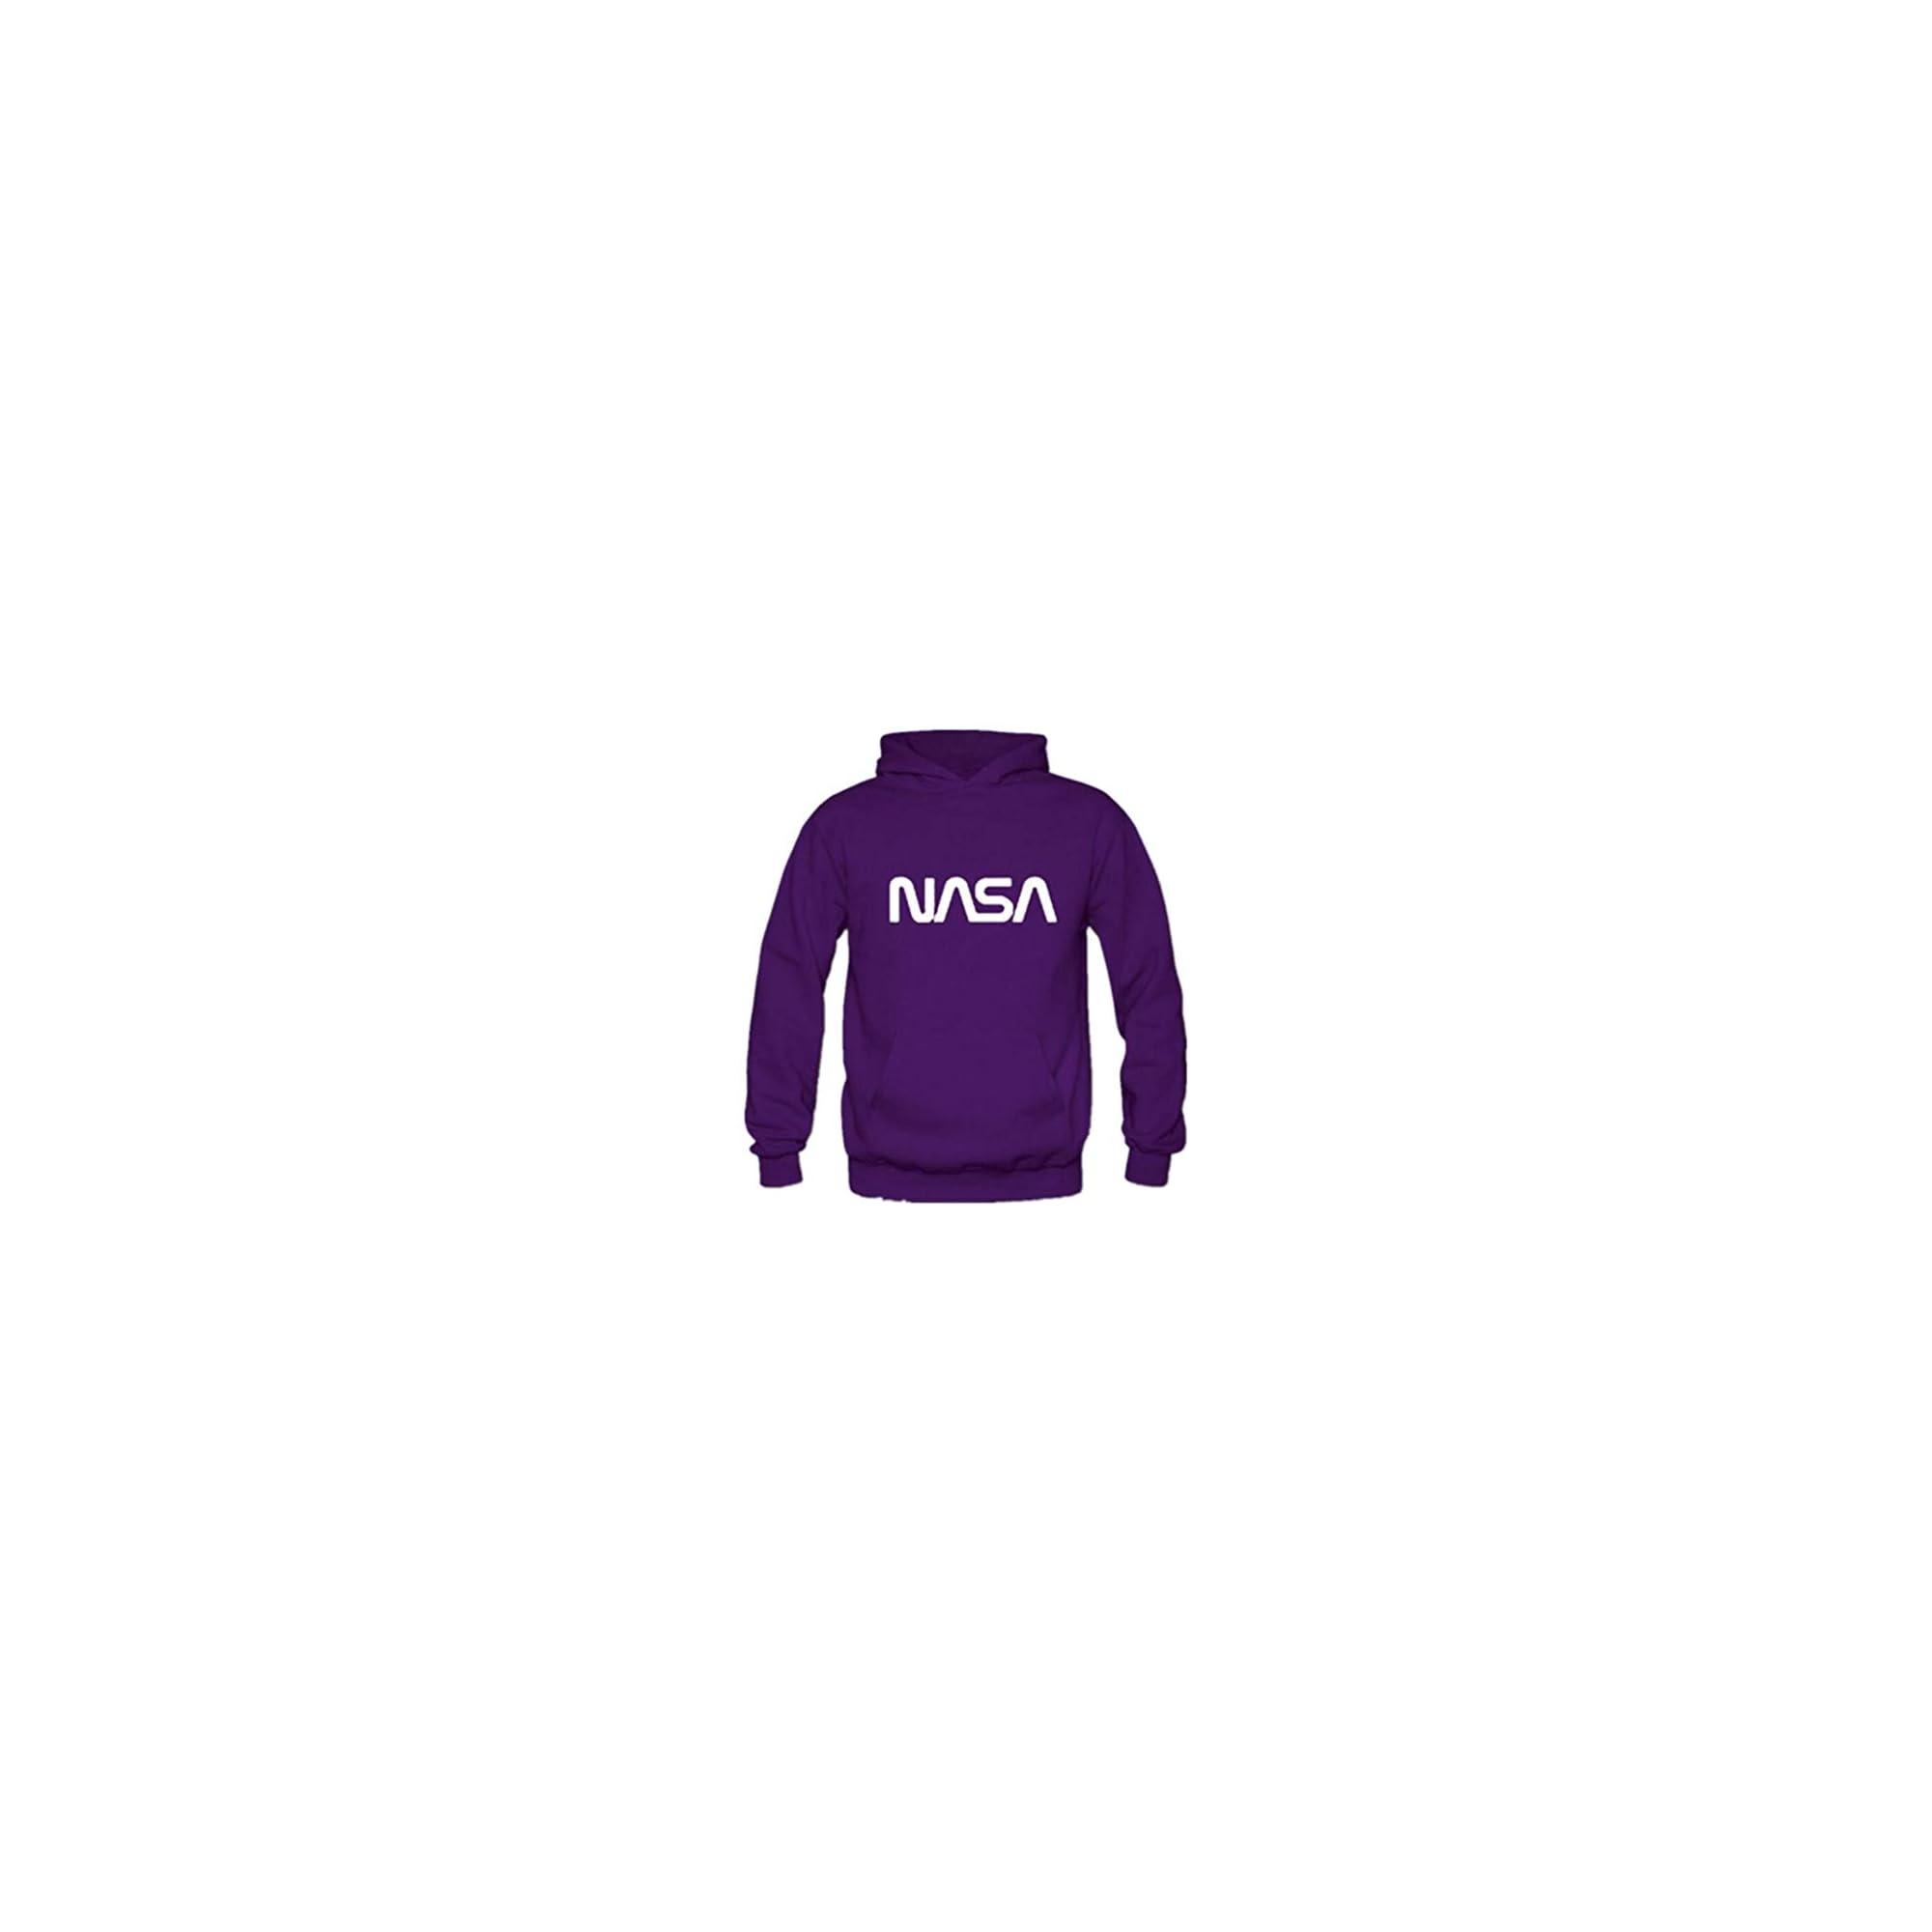 Sudadera Nasa Púrpura